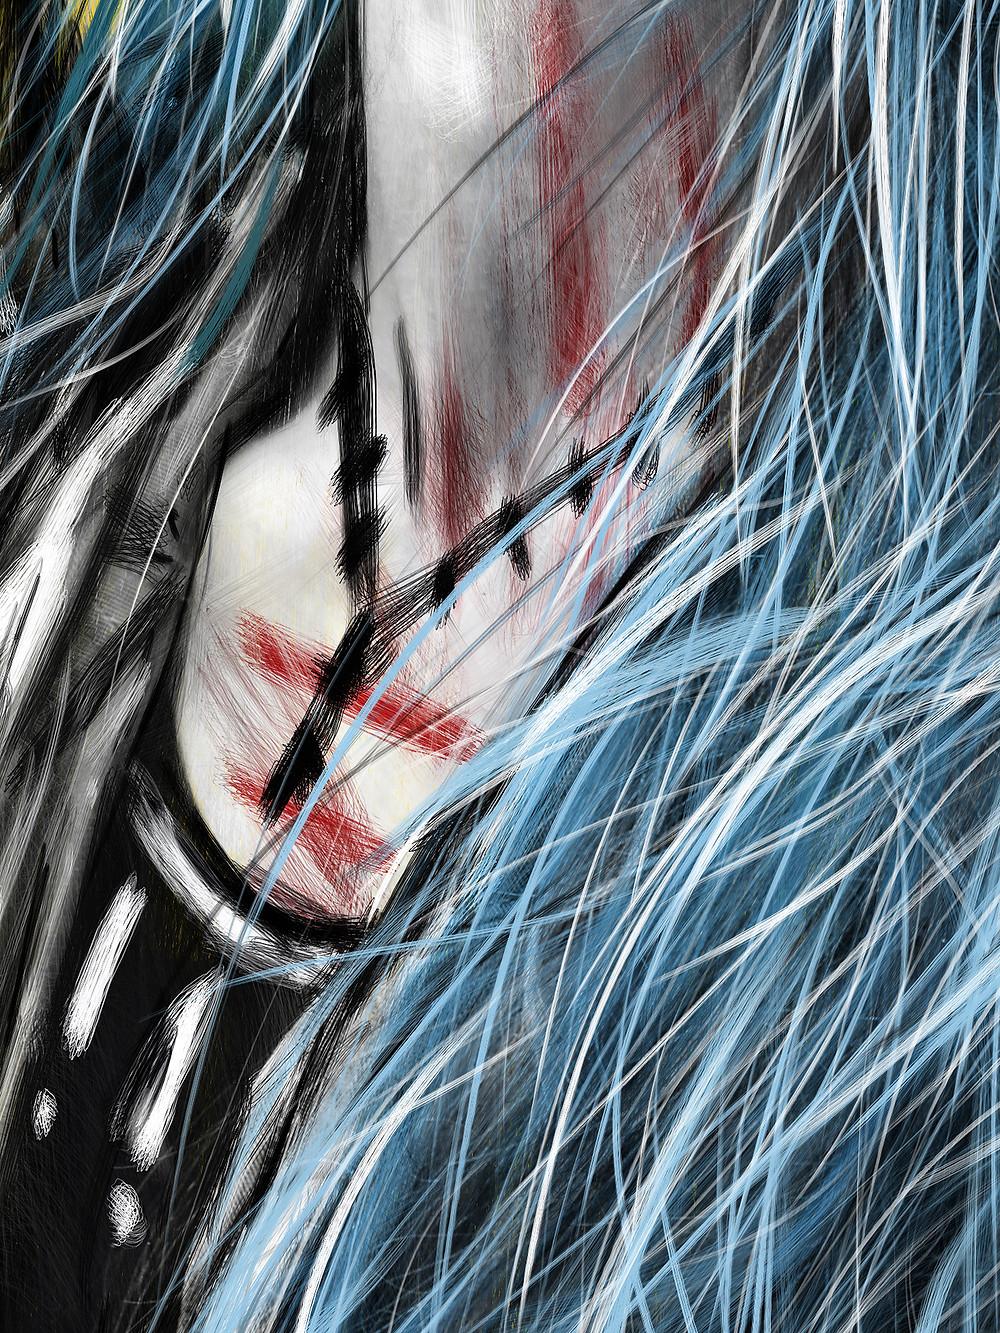 Digital Art Detail